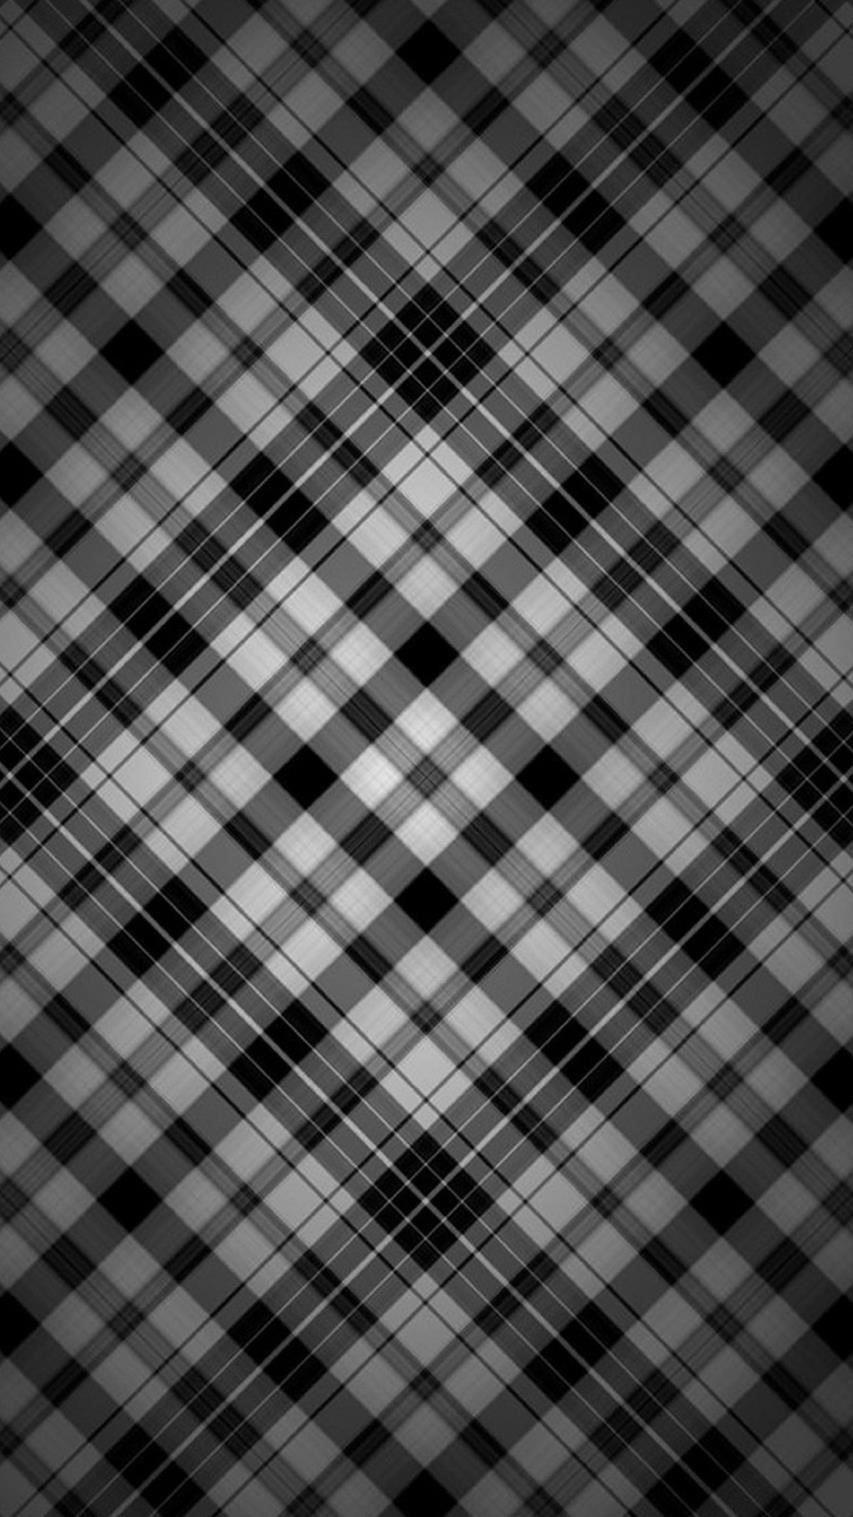 Wallpaper Keren Untuk Hp Samsung Galaxy Mini 2 Wallpaper Hd Keren